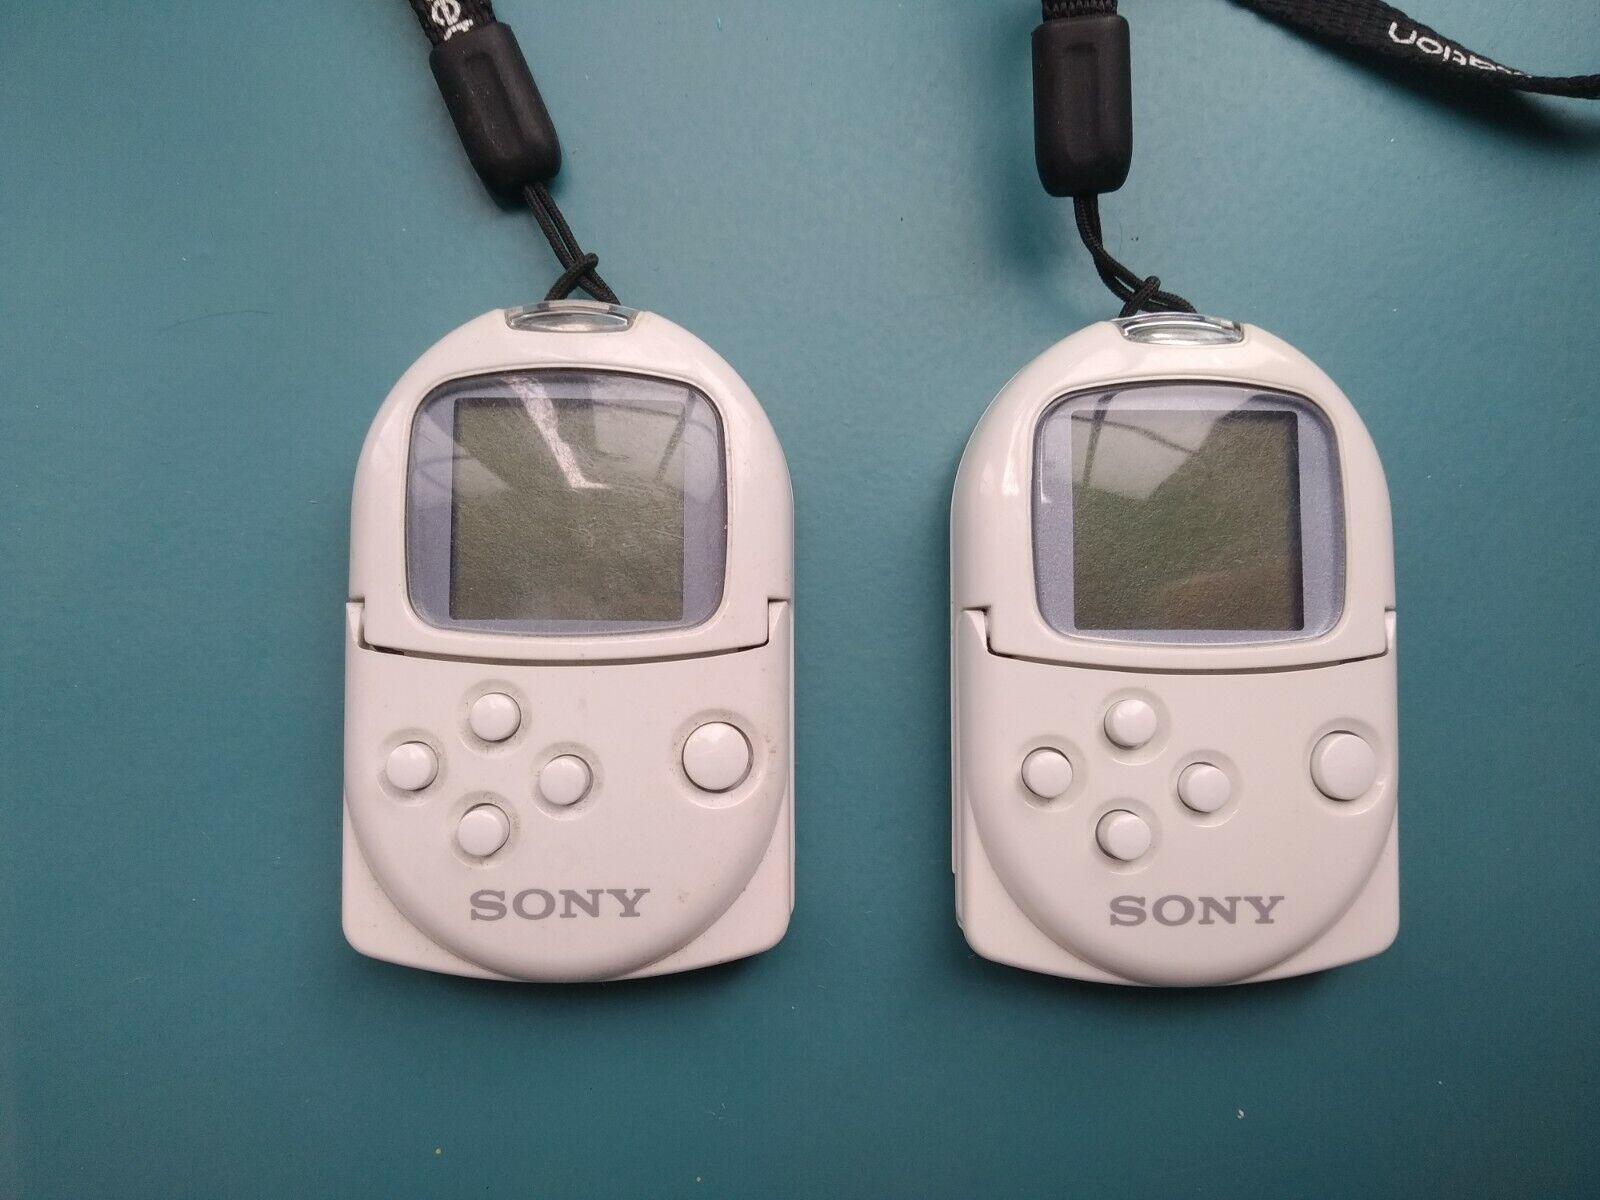 1 x Genuine Sony PS1 PocketStation Memory Card White With Strap